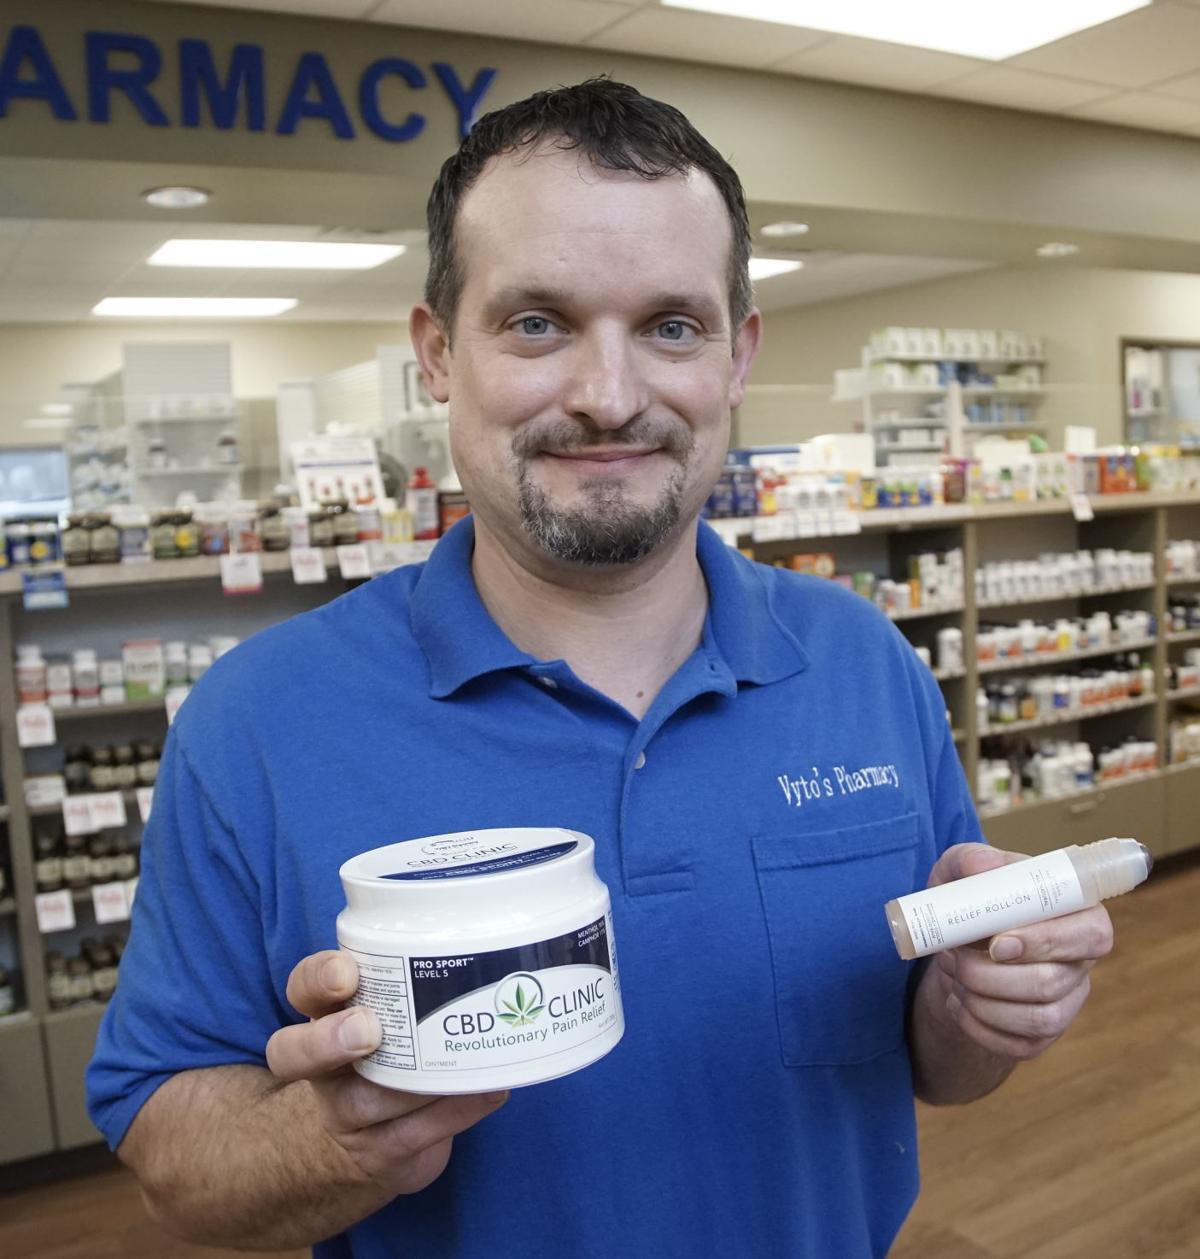 Region experts use hemp-based CBD oil to ease pain, anxiety, sleep issues